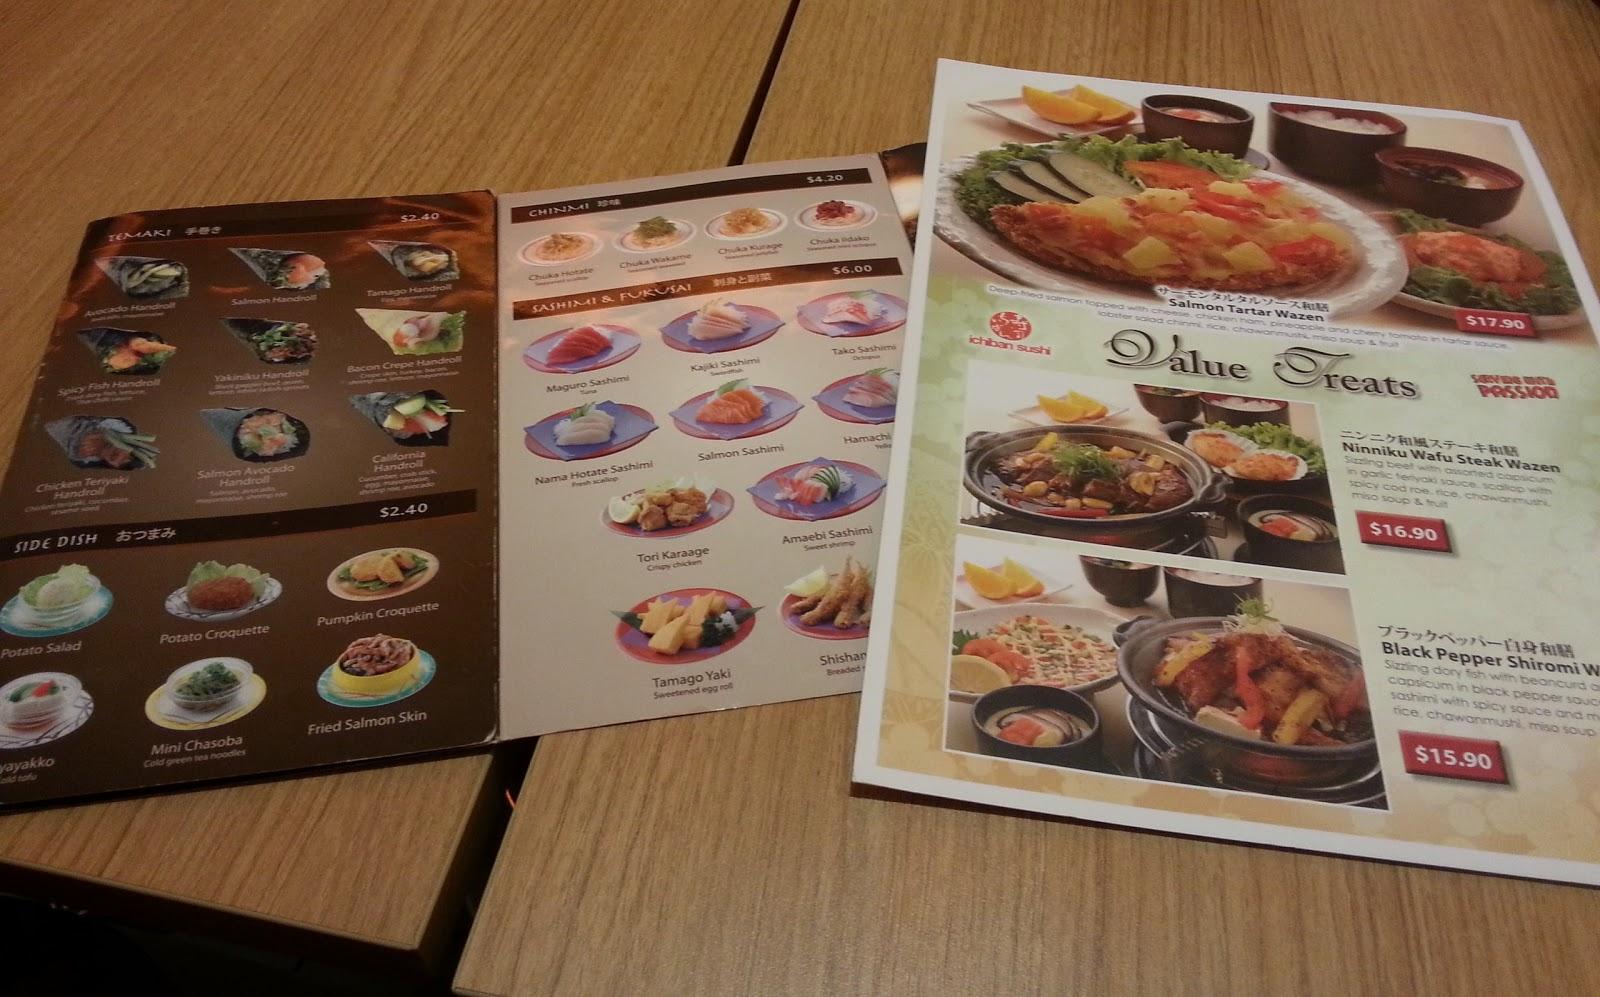 Ichiban Japanese Restaurant La Canada Fltrdg Ca